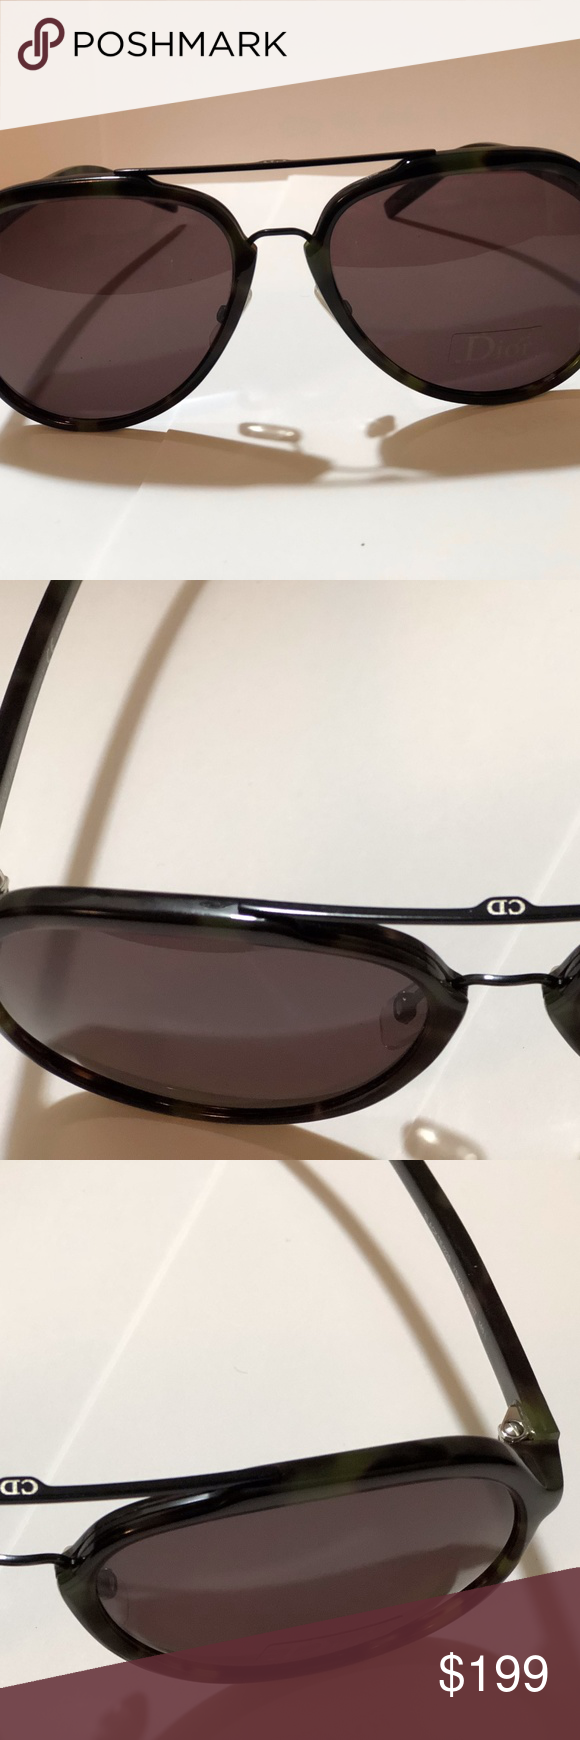 a63461f5c0ec7 DIOR HOMME Black Tie 122S DIOR HOMME Black Tie 122S -Dark Havana Aviator  MADE IN ITALY Christian Dior Accessories Sunglasses